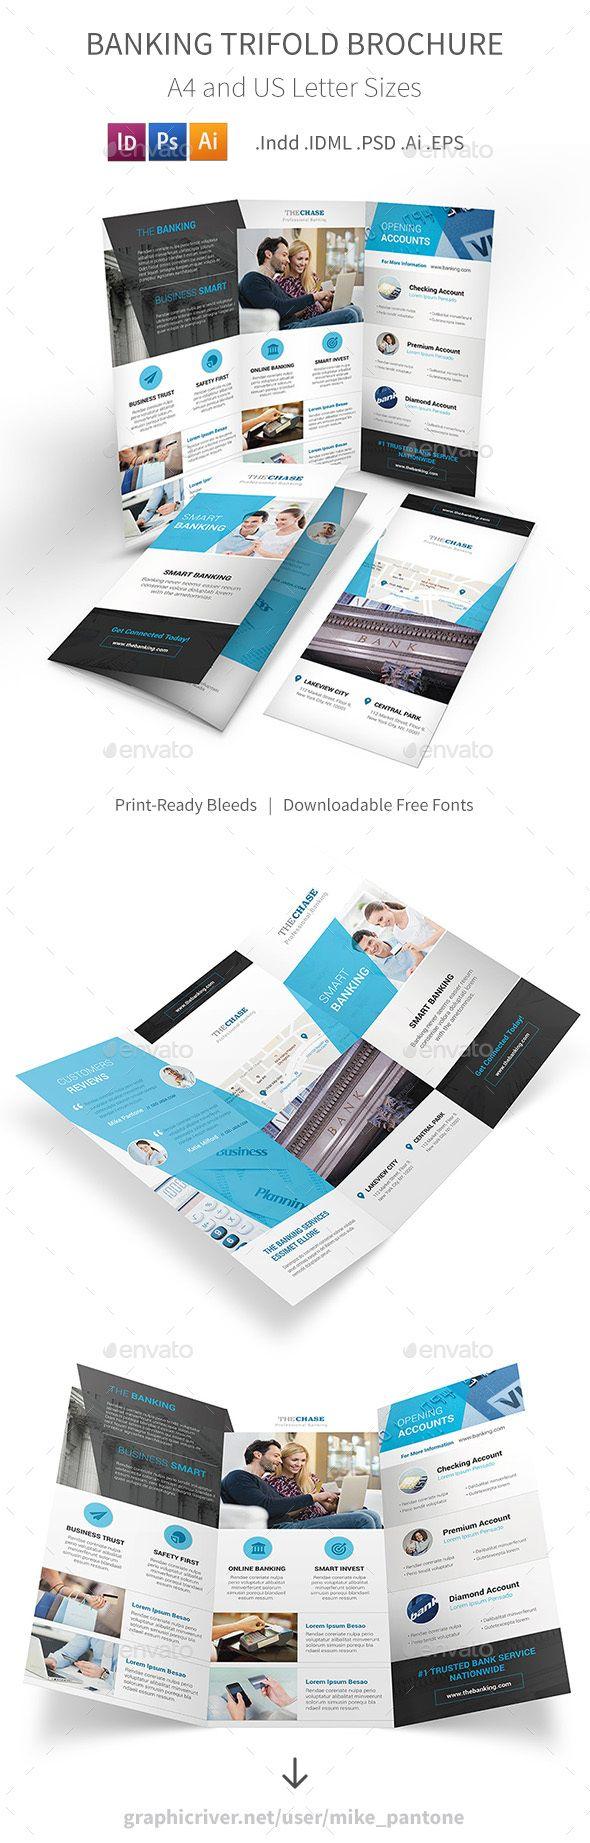 Banking Trifold Brochure Brochures Brochure Template And Ai - Tri fold brochure template illustrator